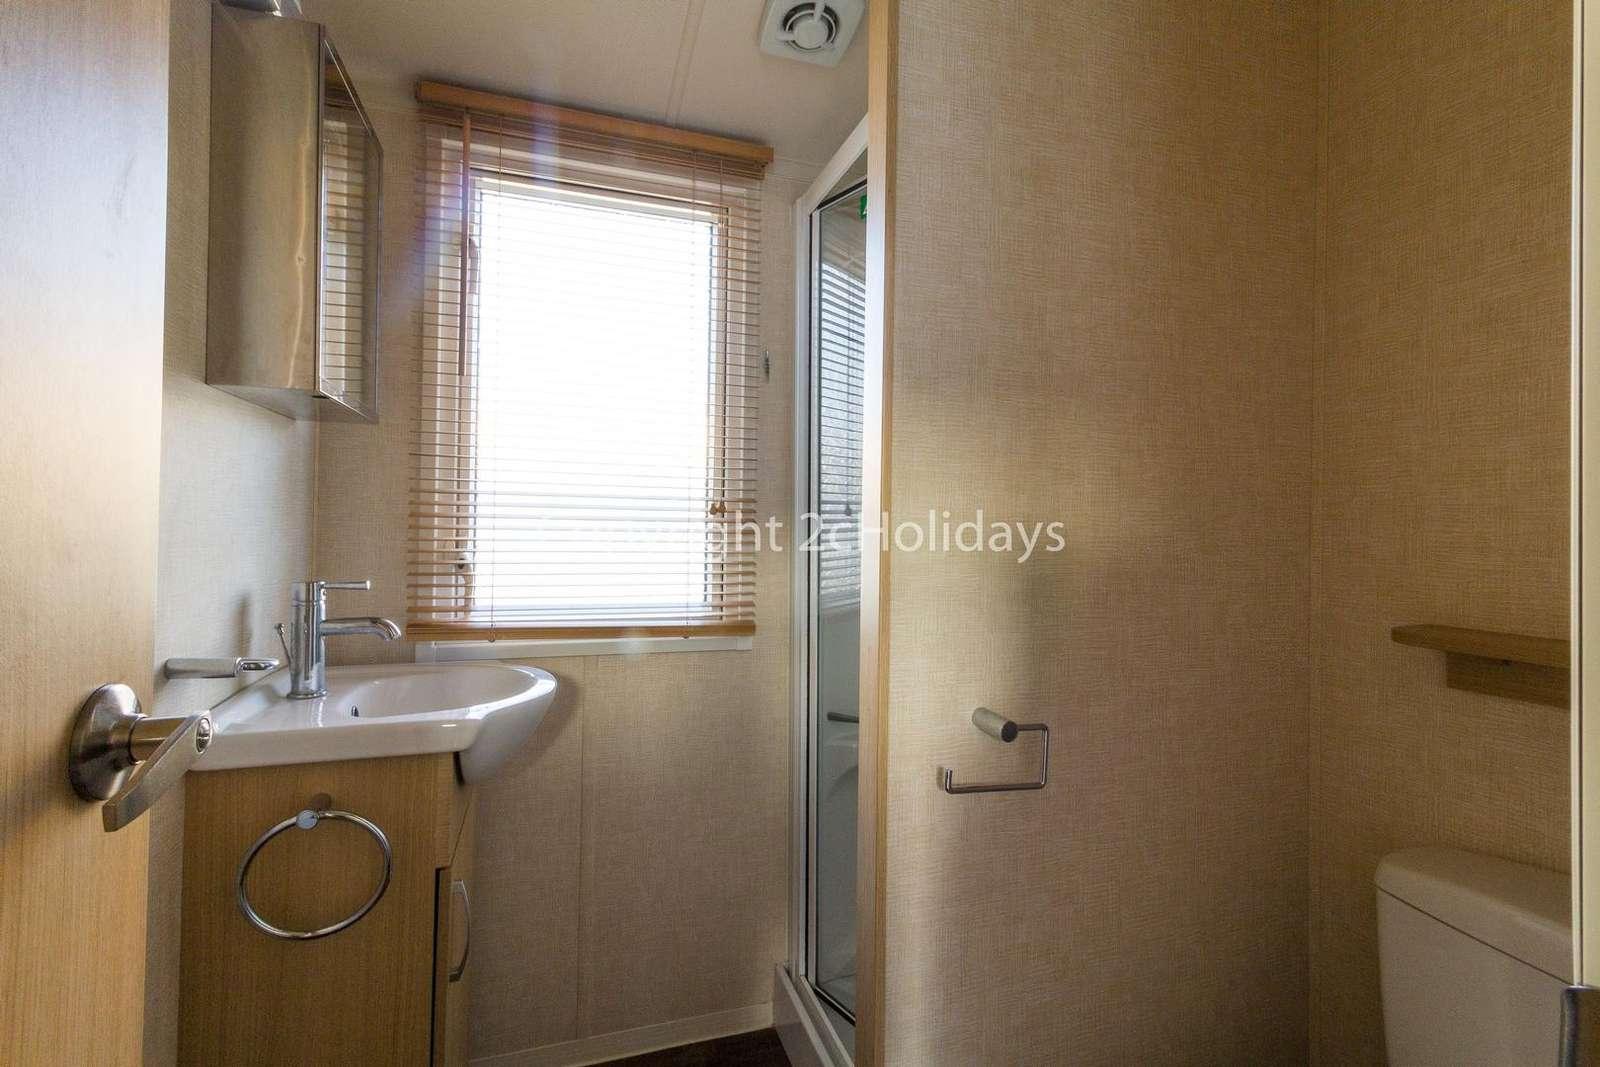 Ideal family shower room